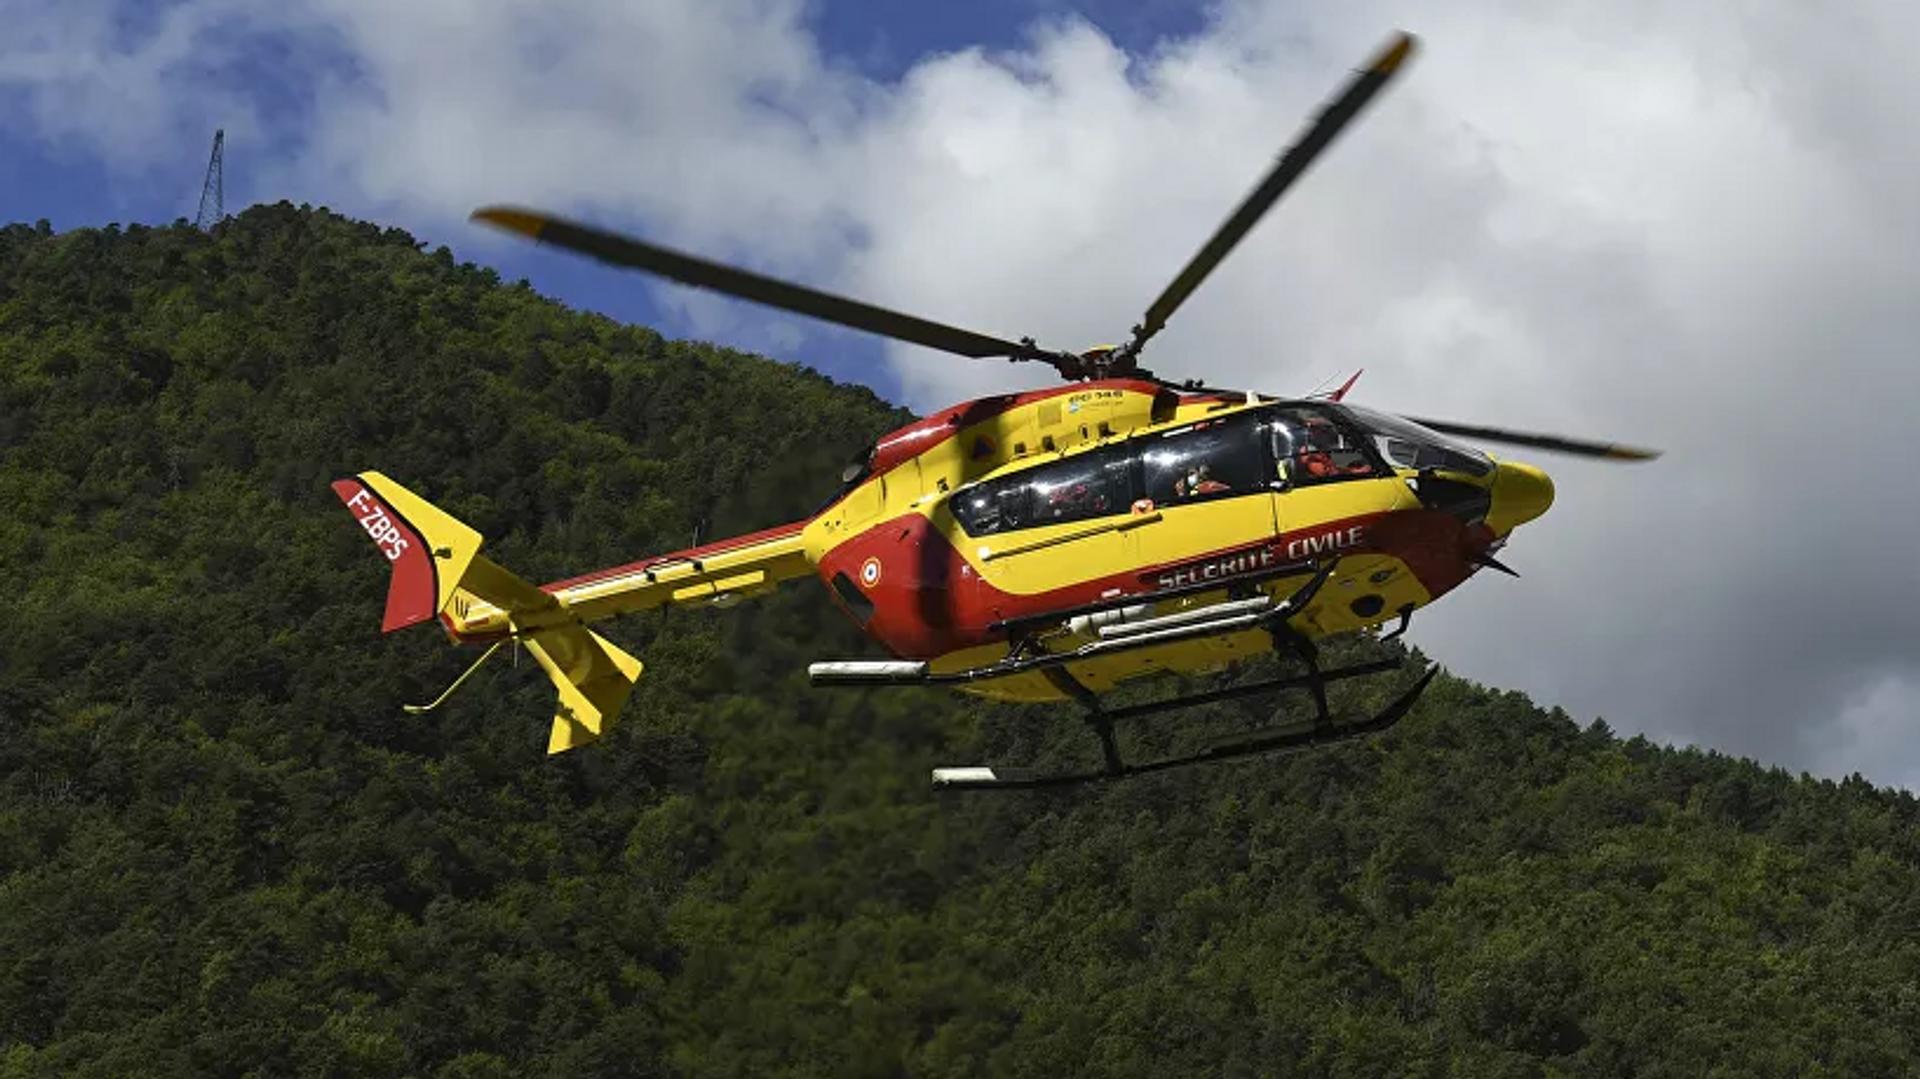 Helicóptero Eurocopter EC145 de la Guardia Civil de Francia (archivo) - Sputnik Mundo, 1920, 12.09.2021